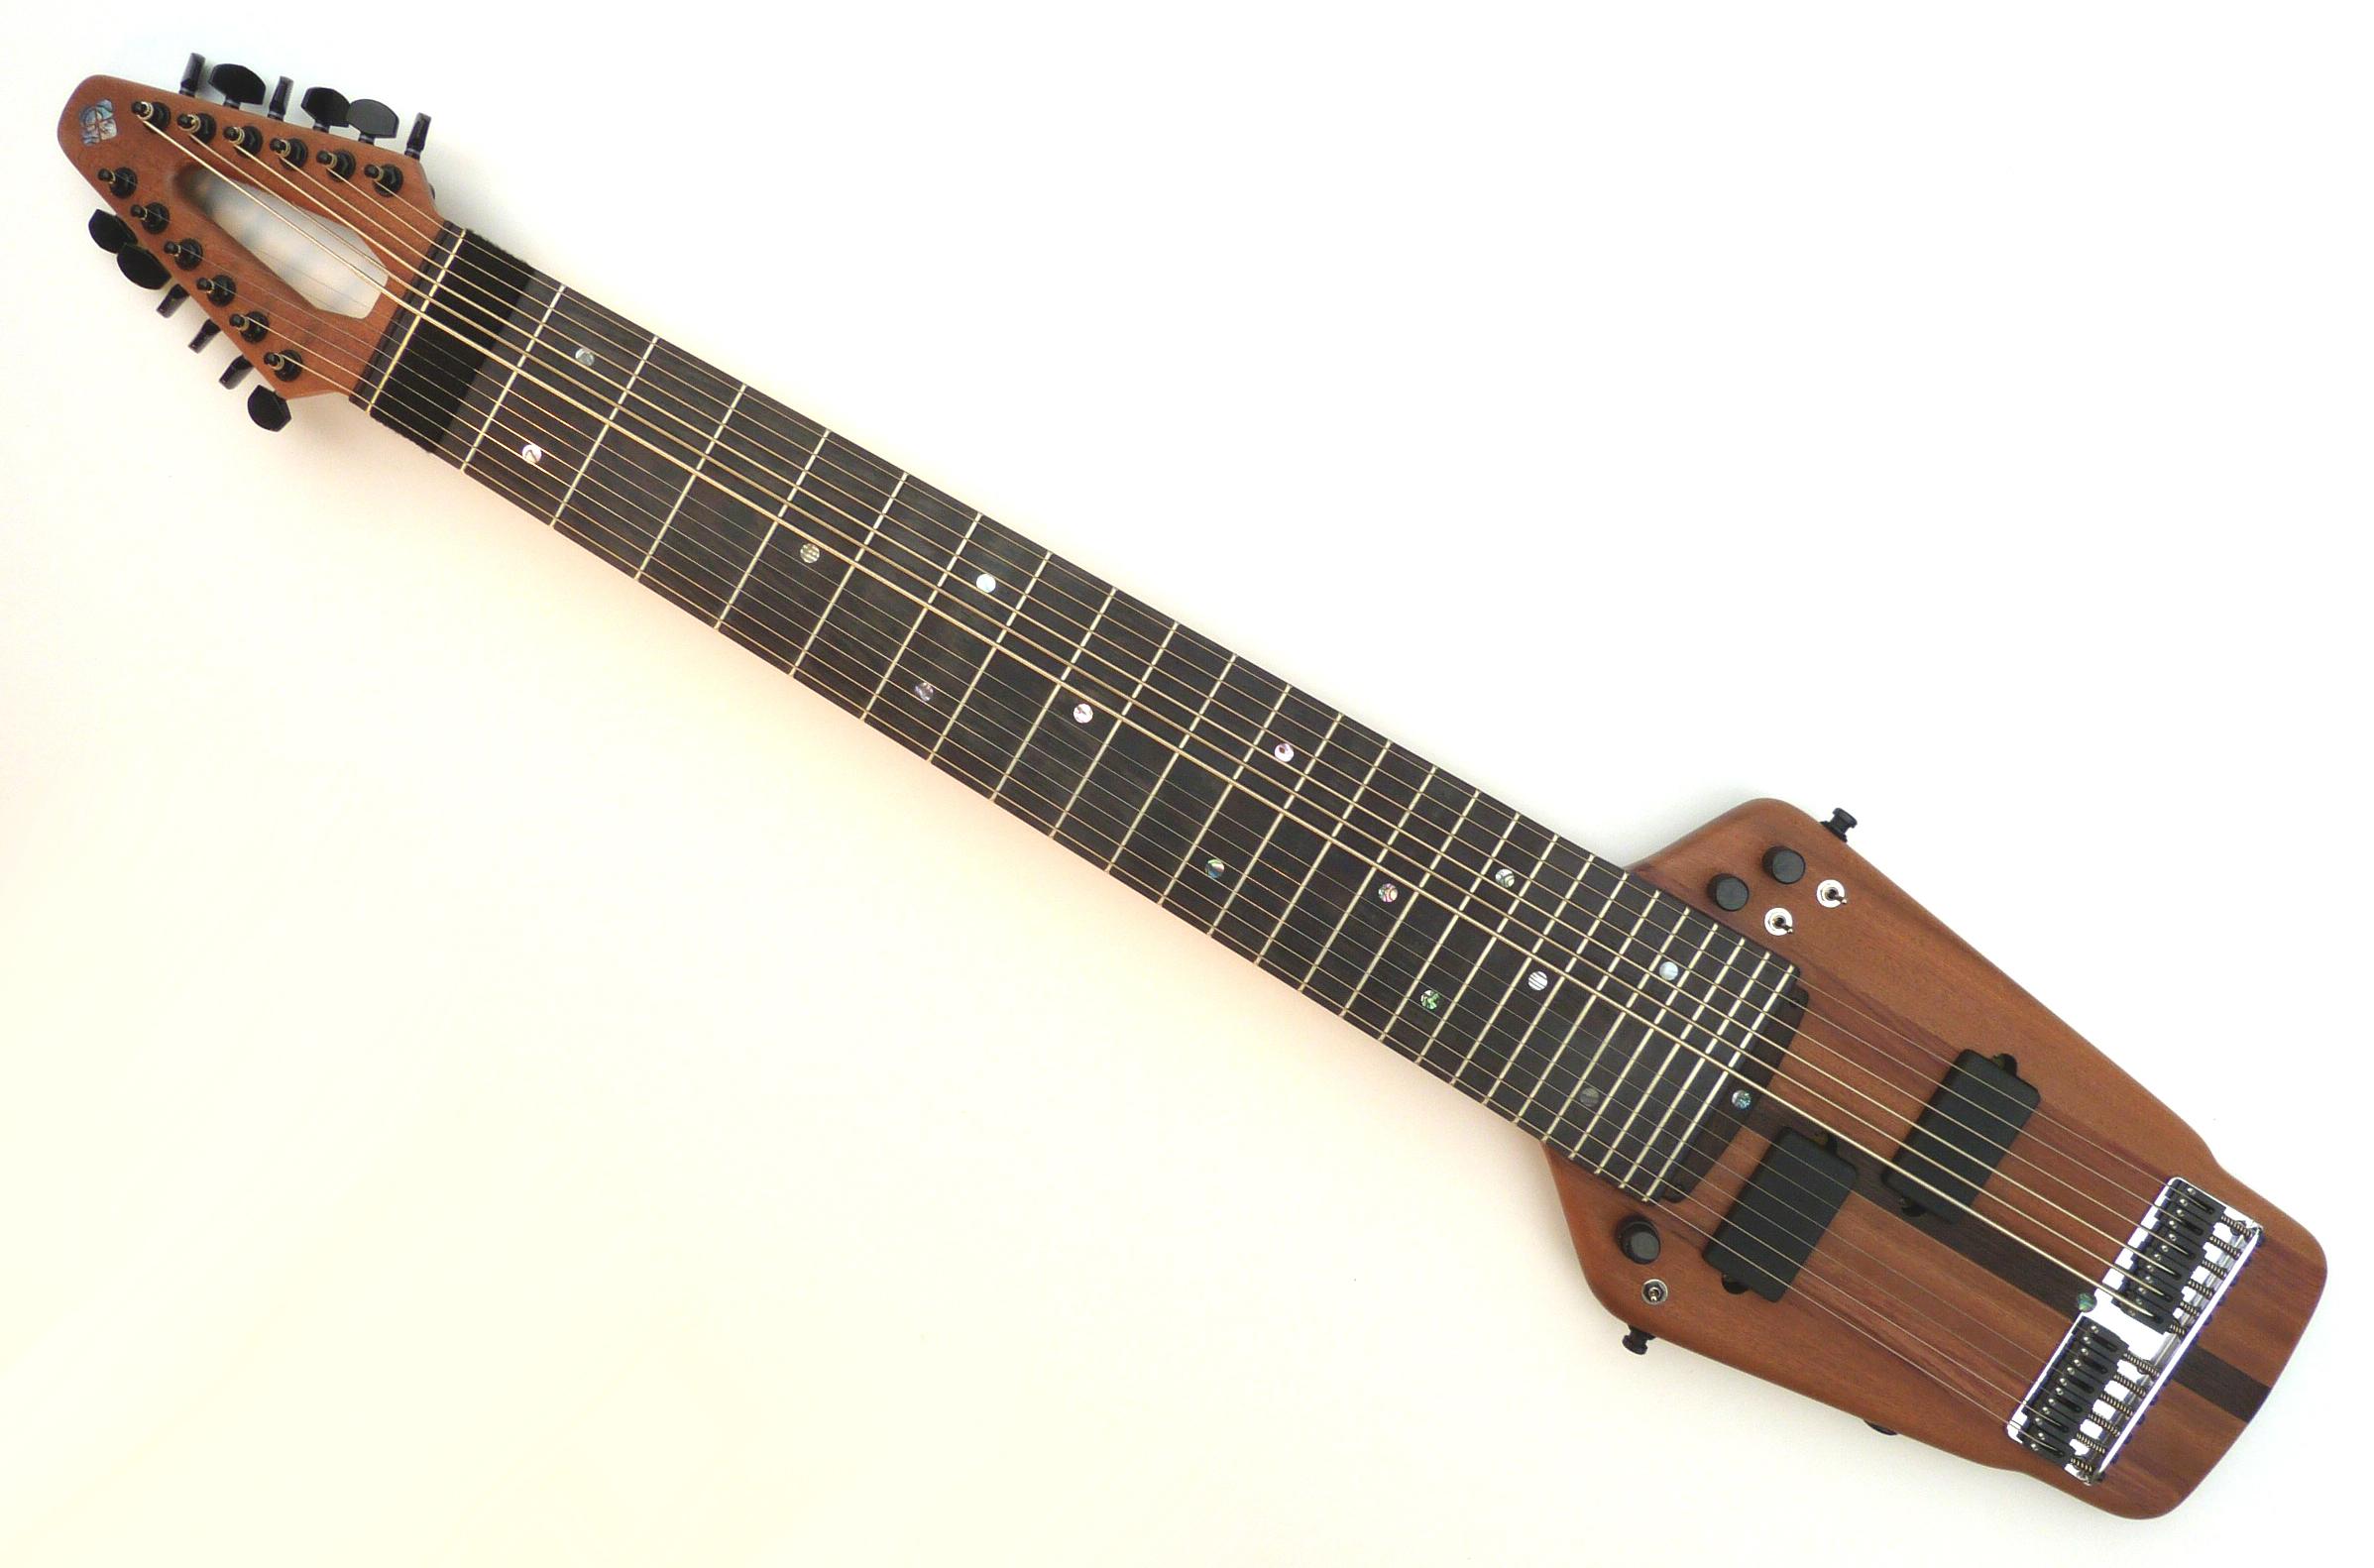 The Megatar 12-String Bass